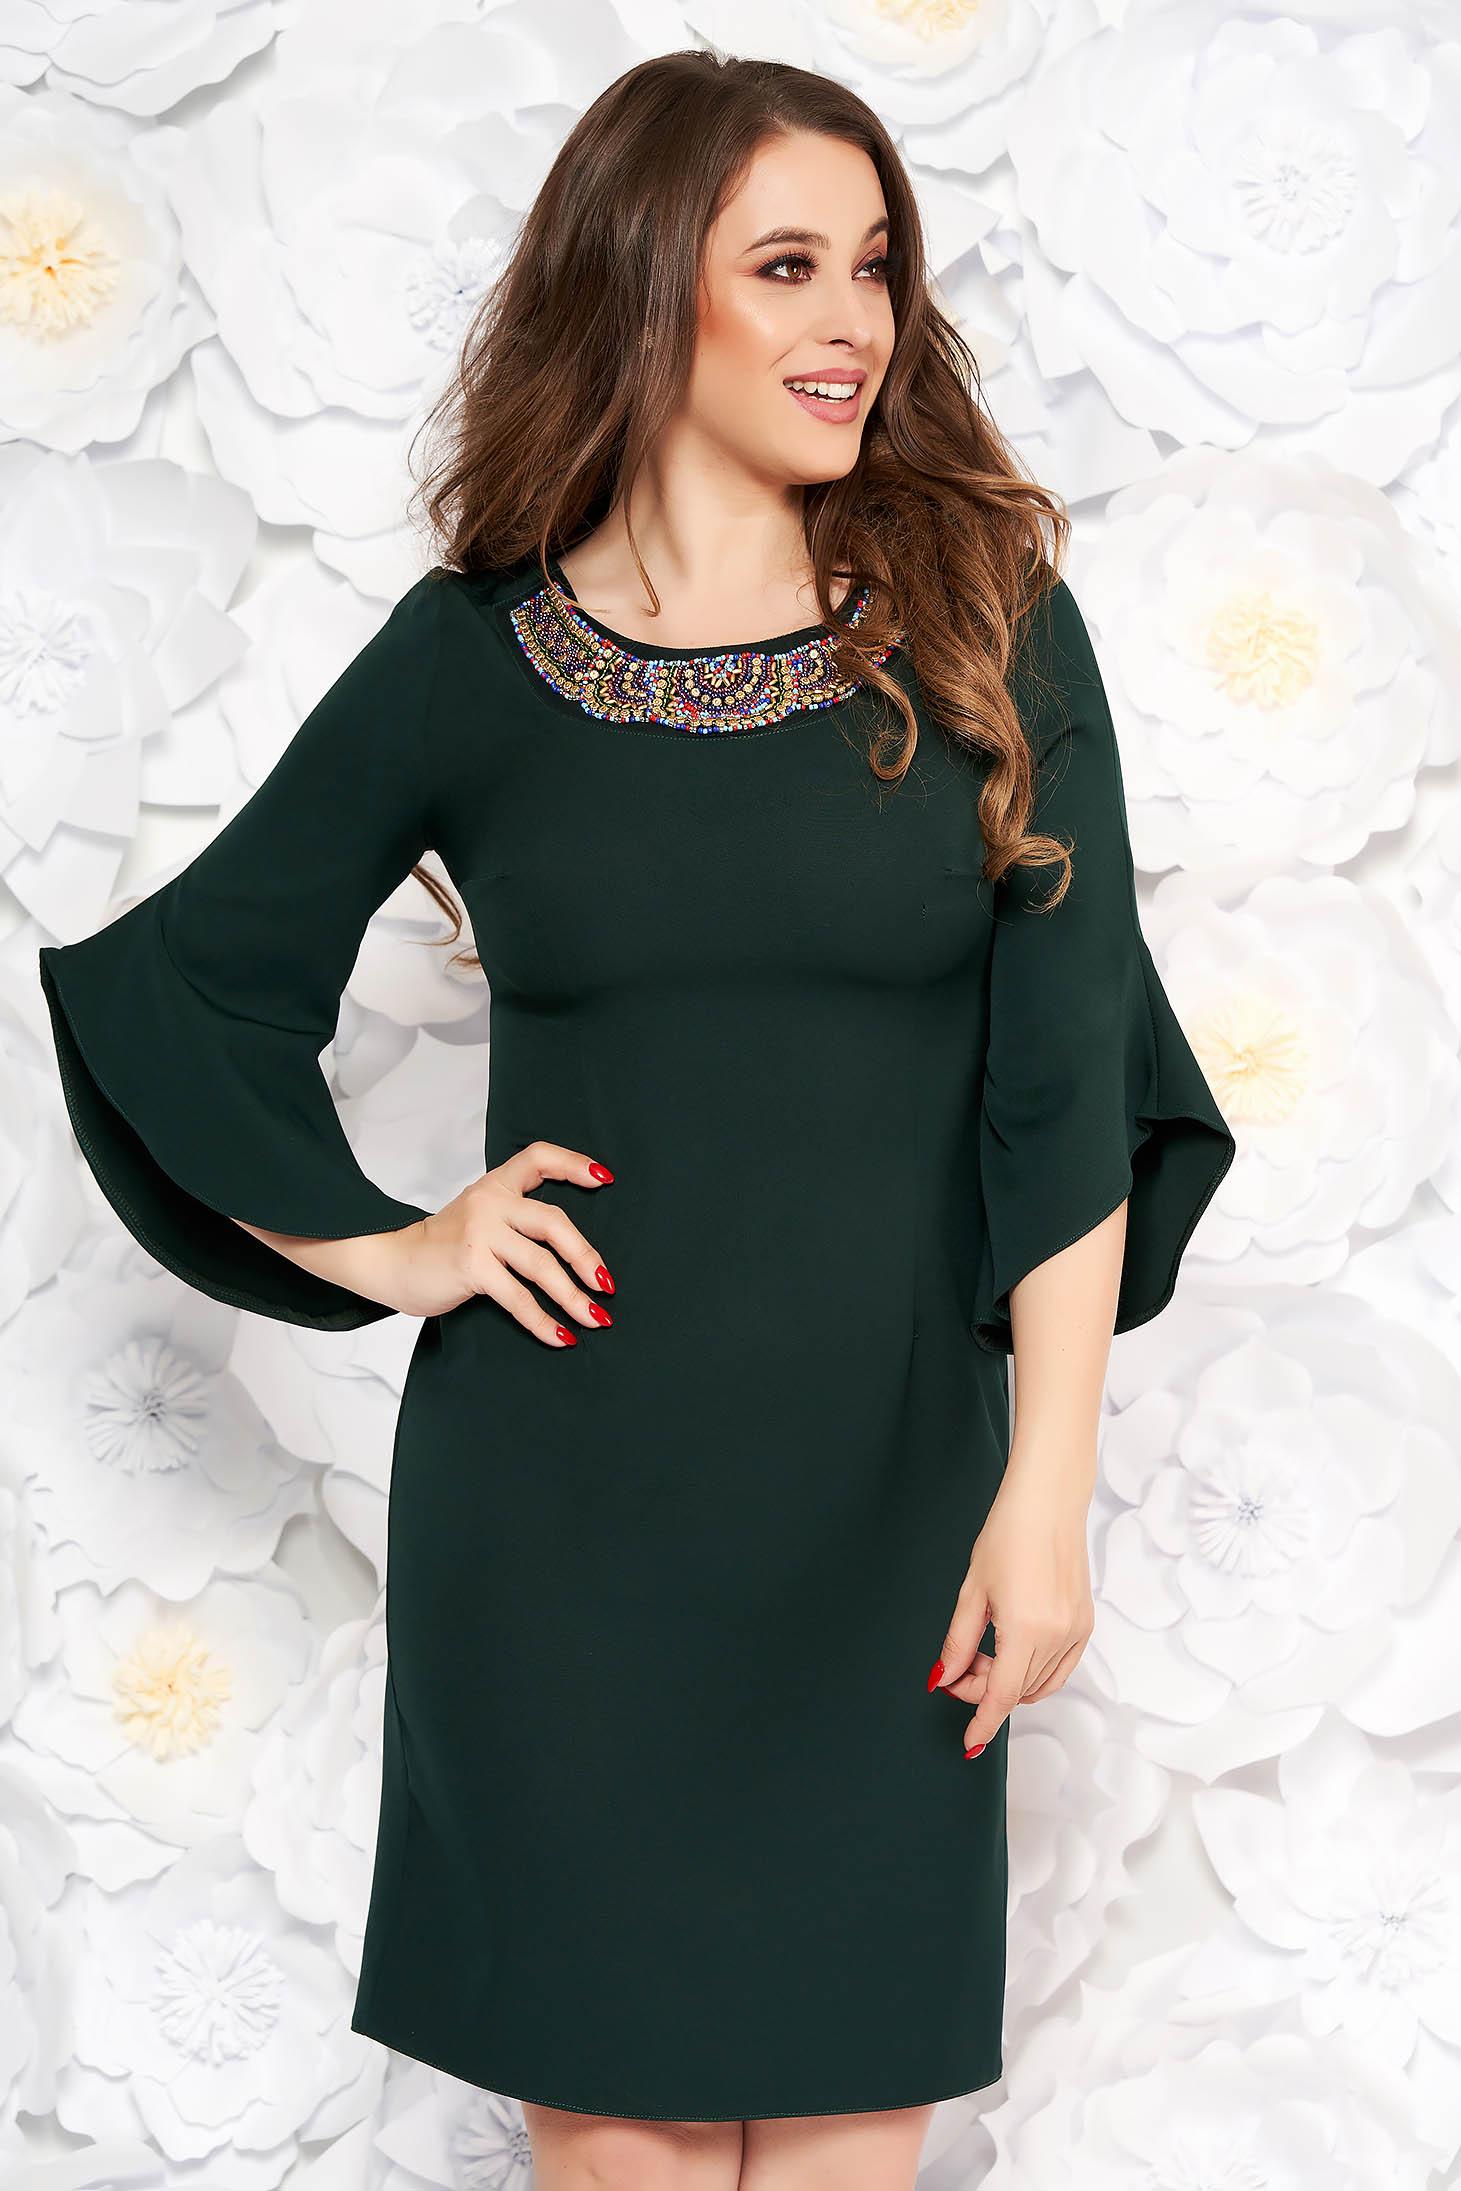 Rochie verde-inchis eleganta tip creion din stofa subtire usor elastica cu maneci trei-sferturi cu aplicatii cu margele